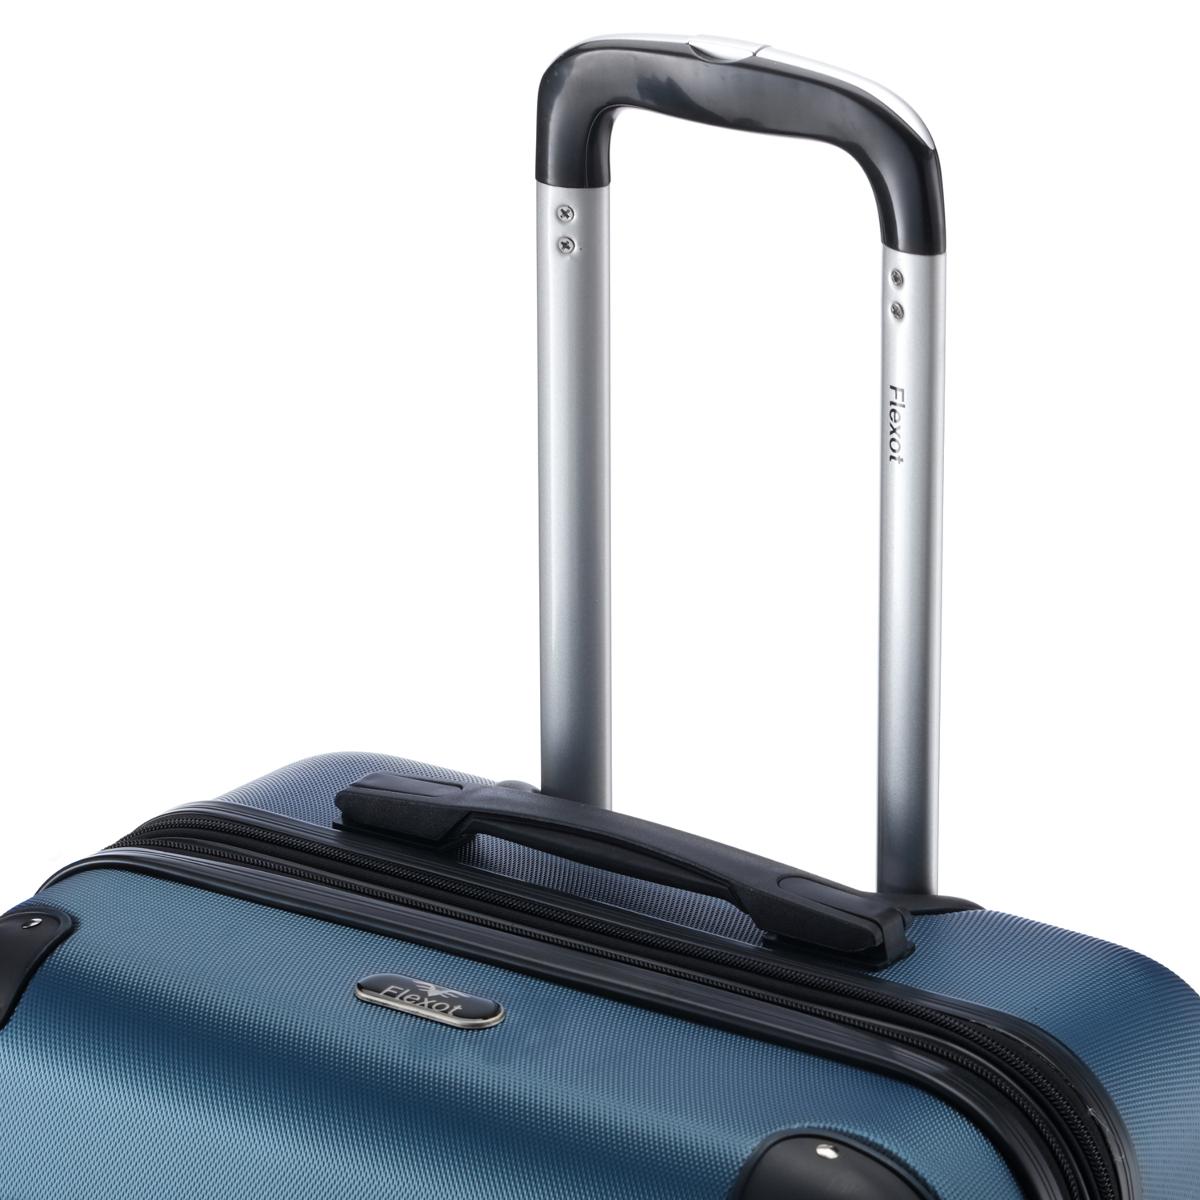 Koffer-Flexot-2045-Hartschalenkoffer-Trolley-Kofferset-Reisekoffer-M-L-XL-Set Indexbild 20